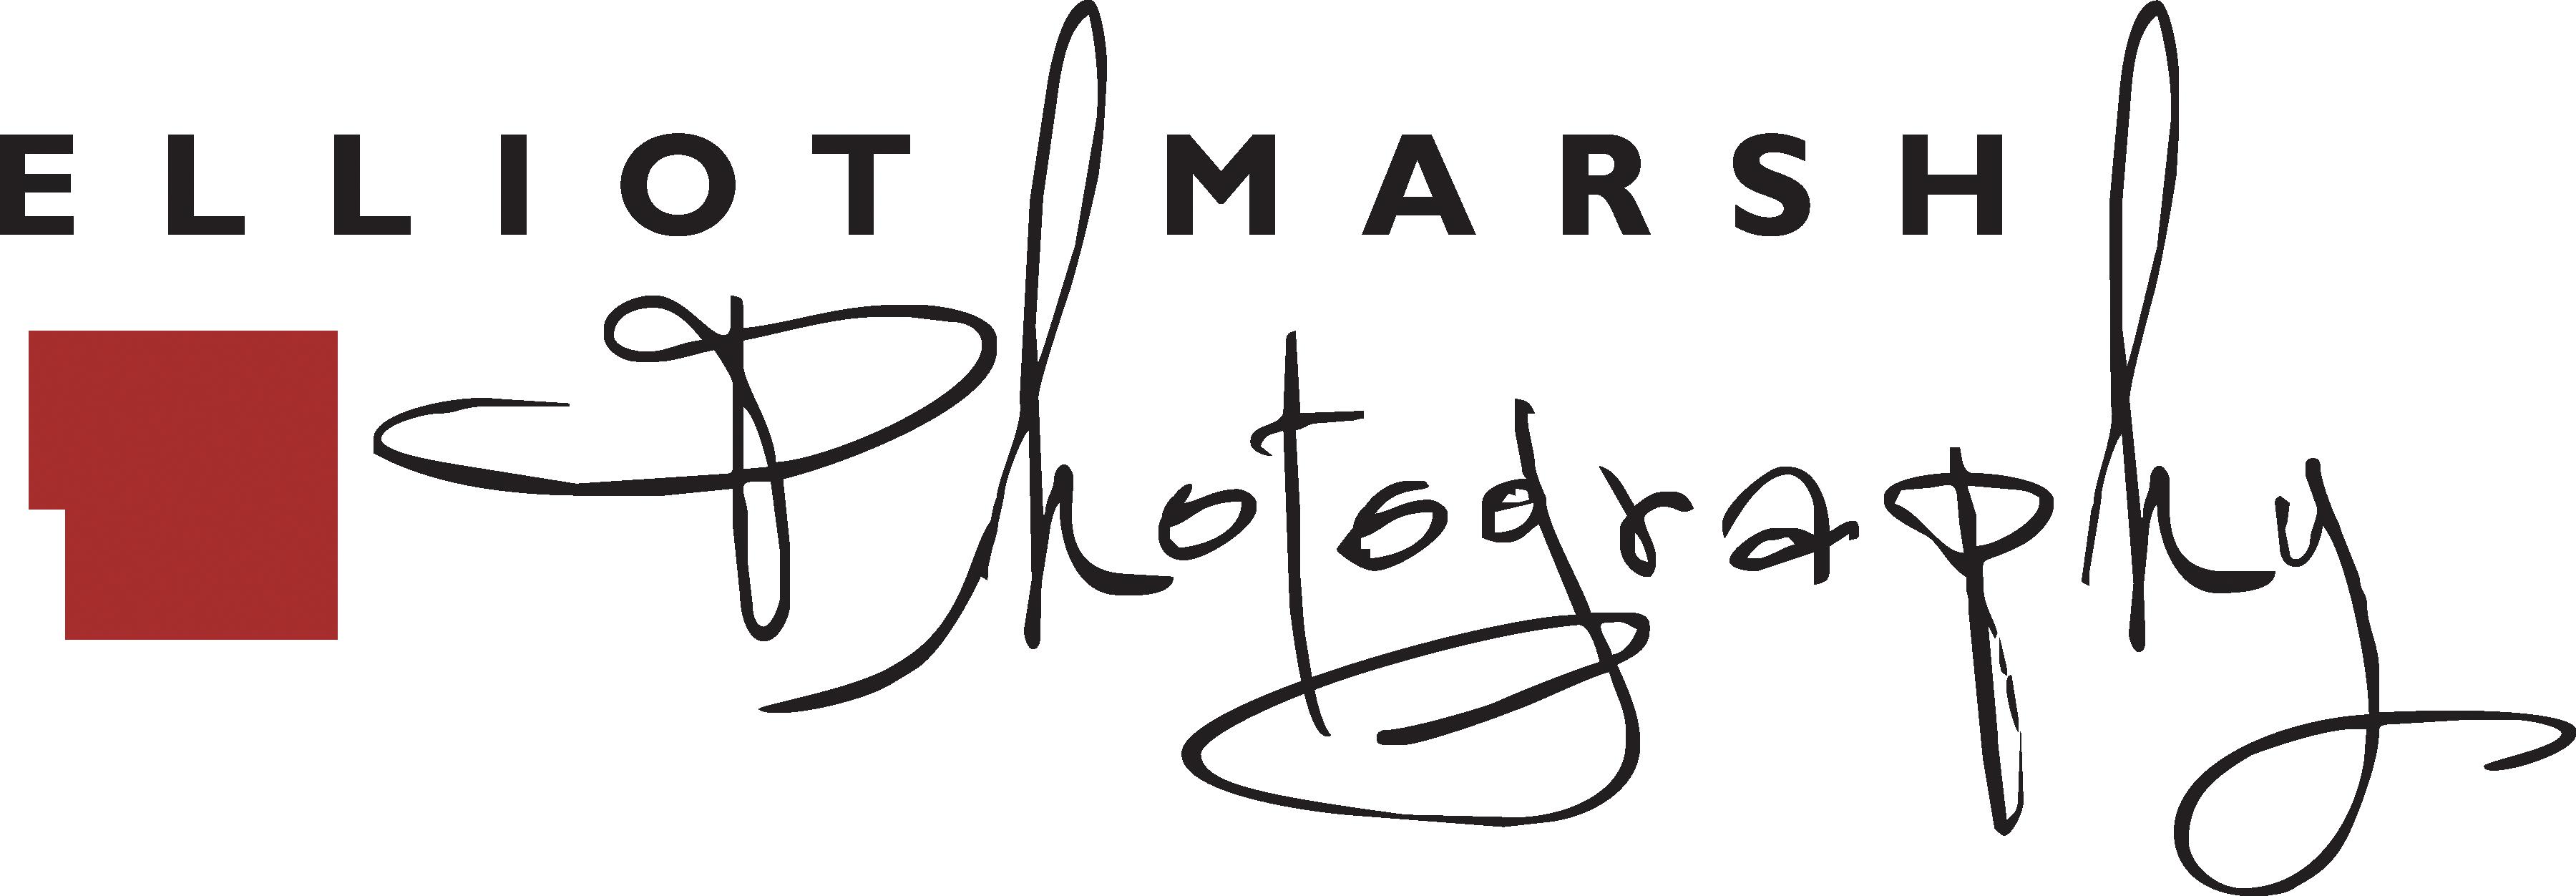 ELLIOT MARSH PHOTOGRAPHY